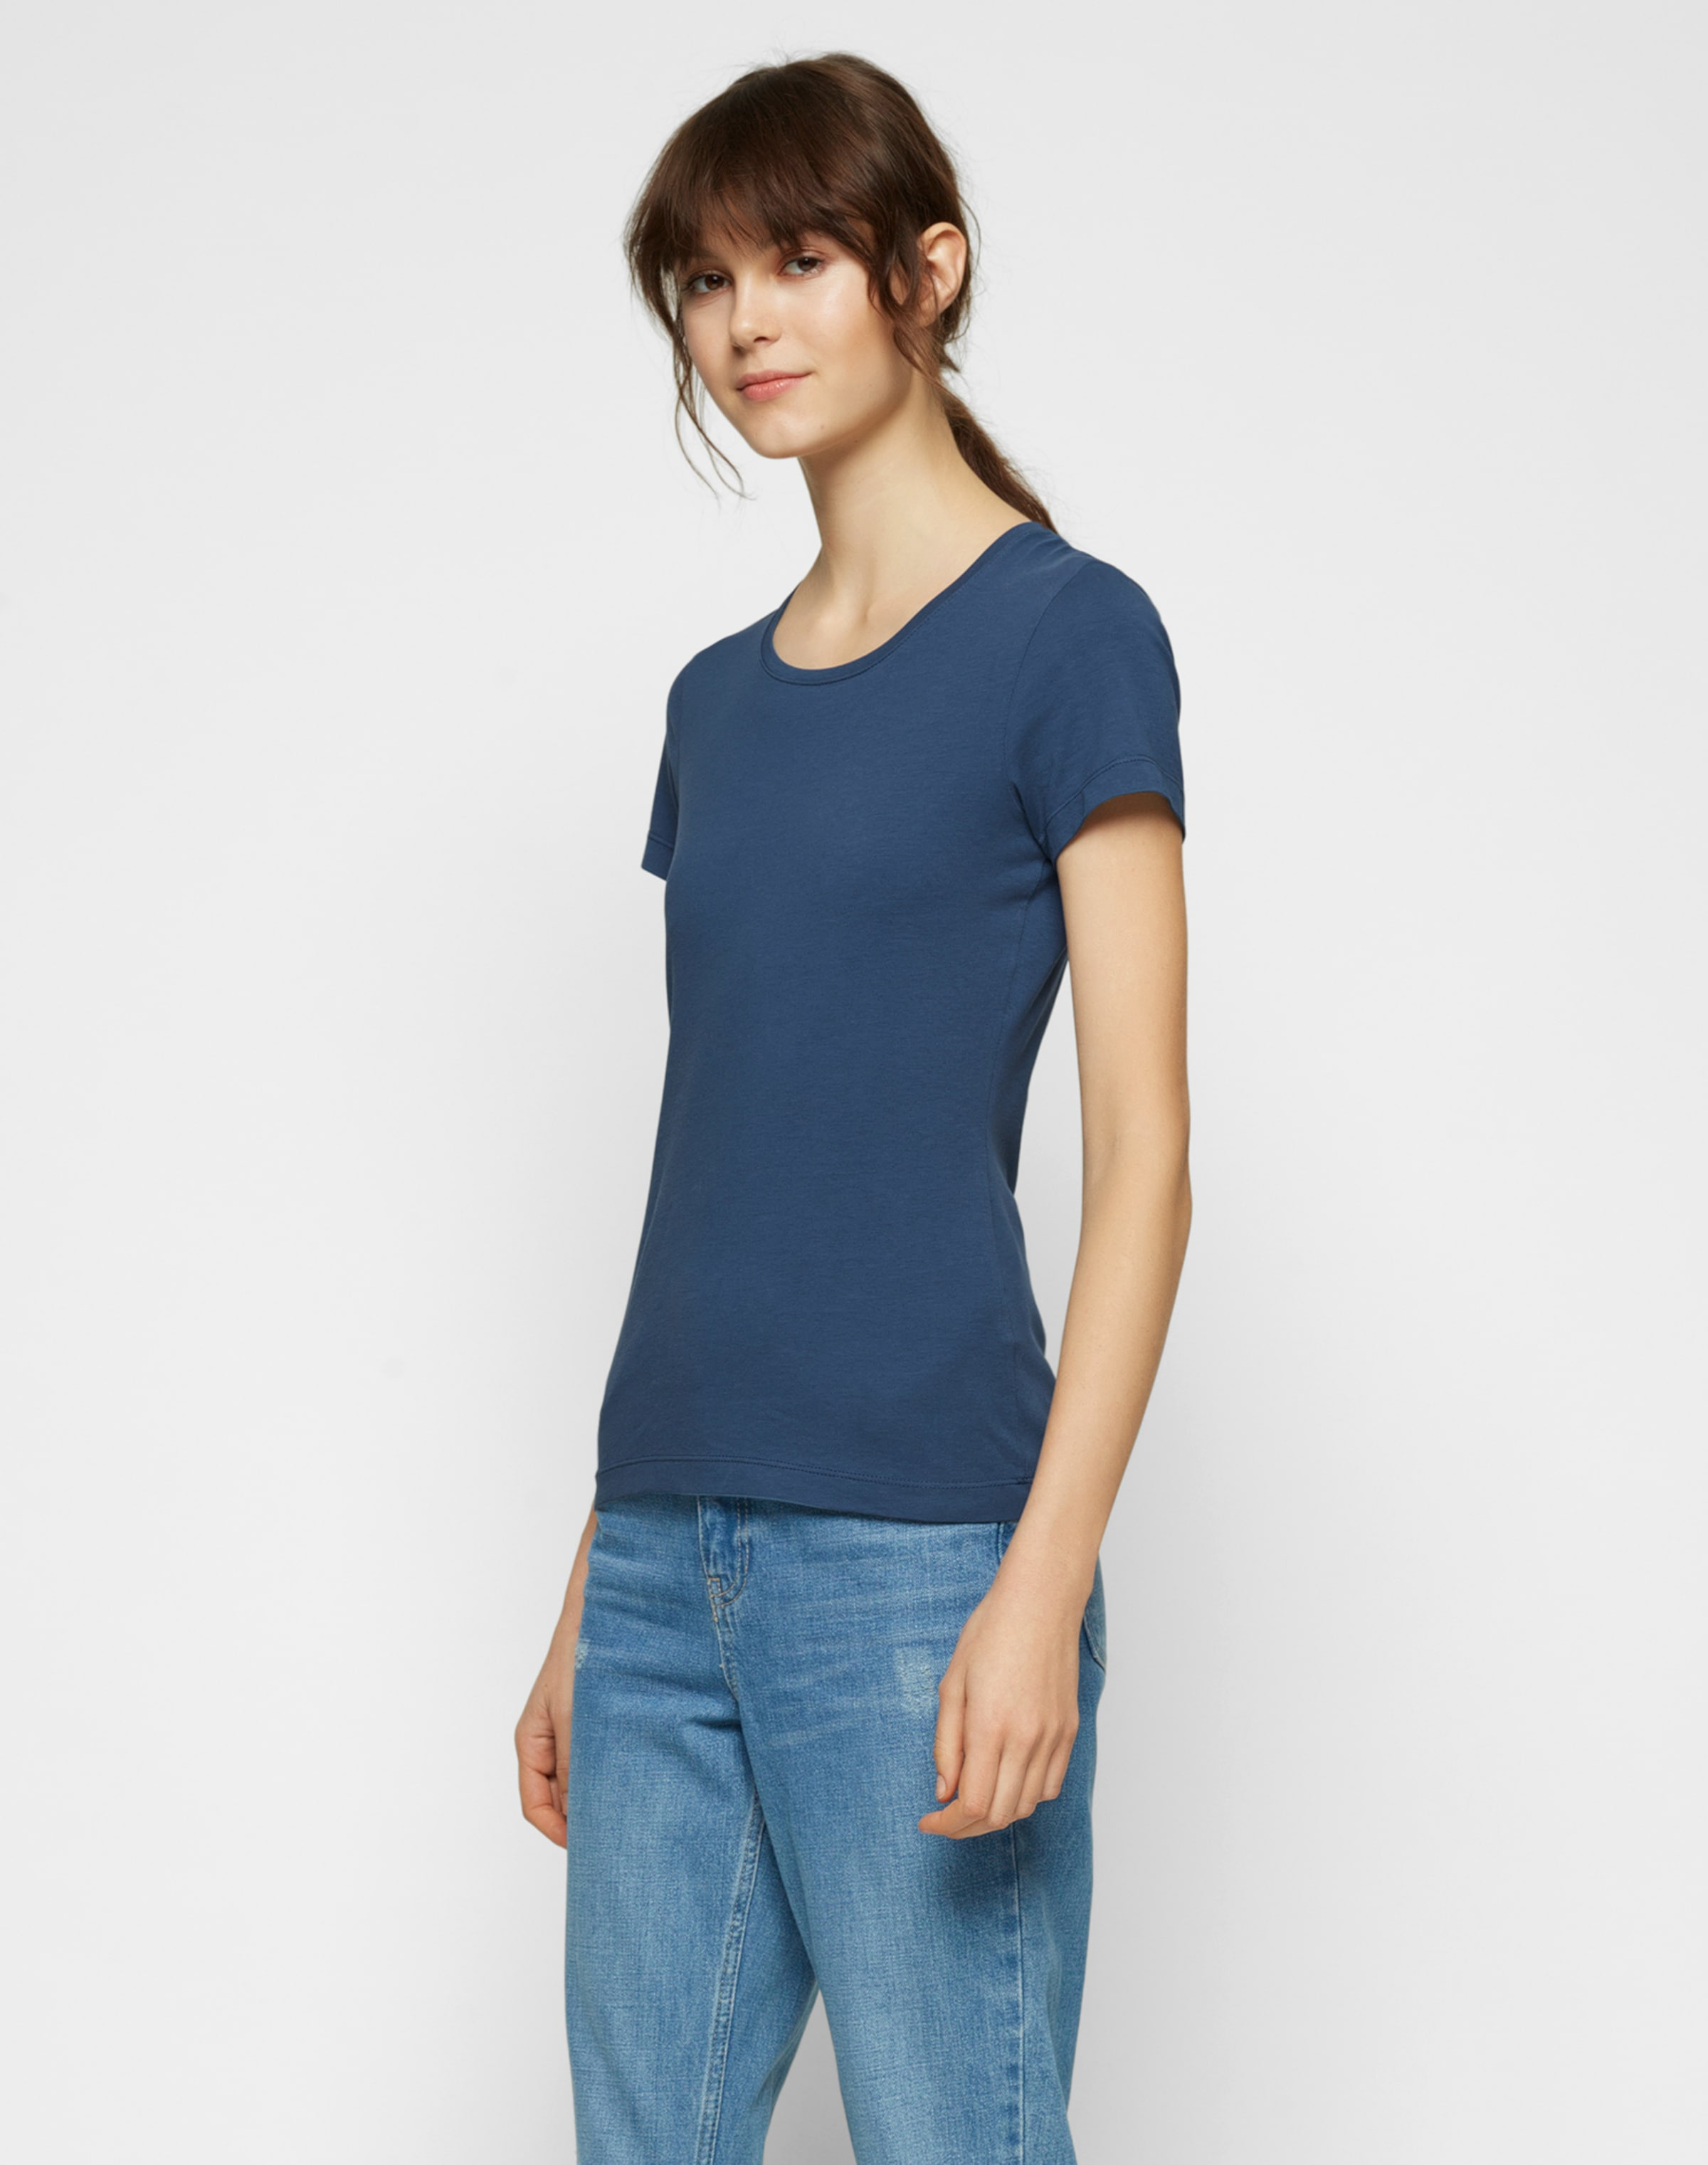 ABOUT YOU Basics Shirt 'Ina' Billige Nicekicks LN4IxxOa